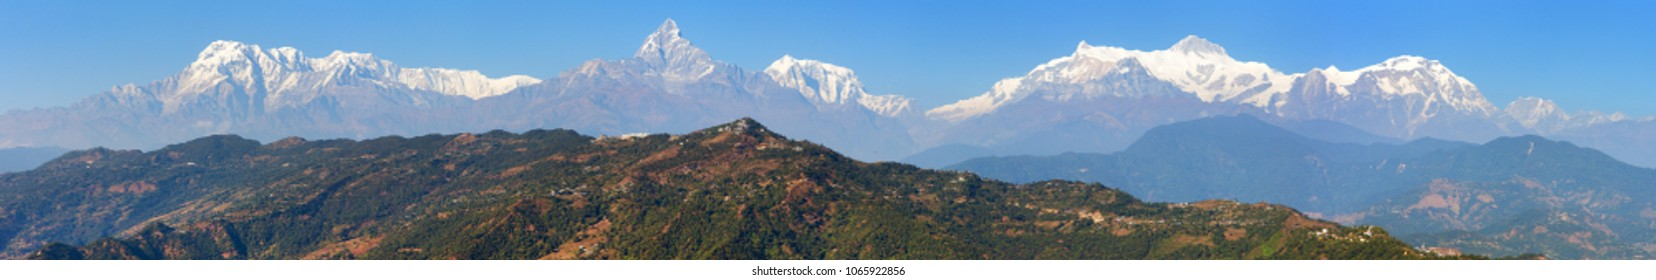 Panoramic view of Annapurna range, Nepal Himalayas mountains